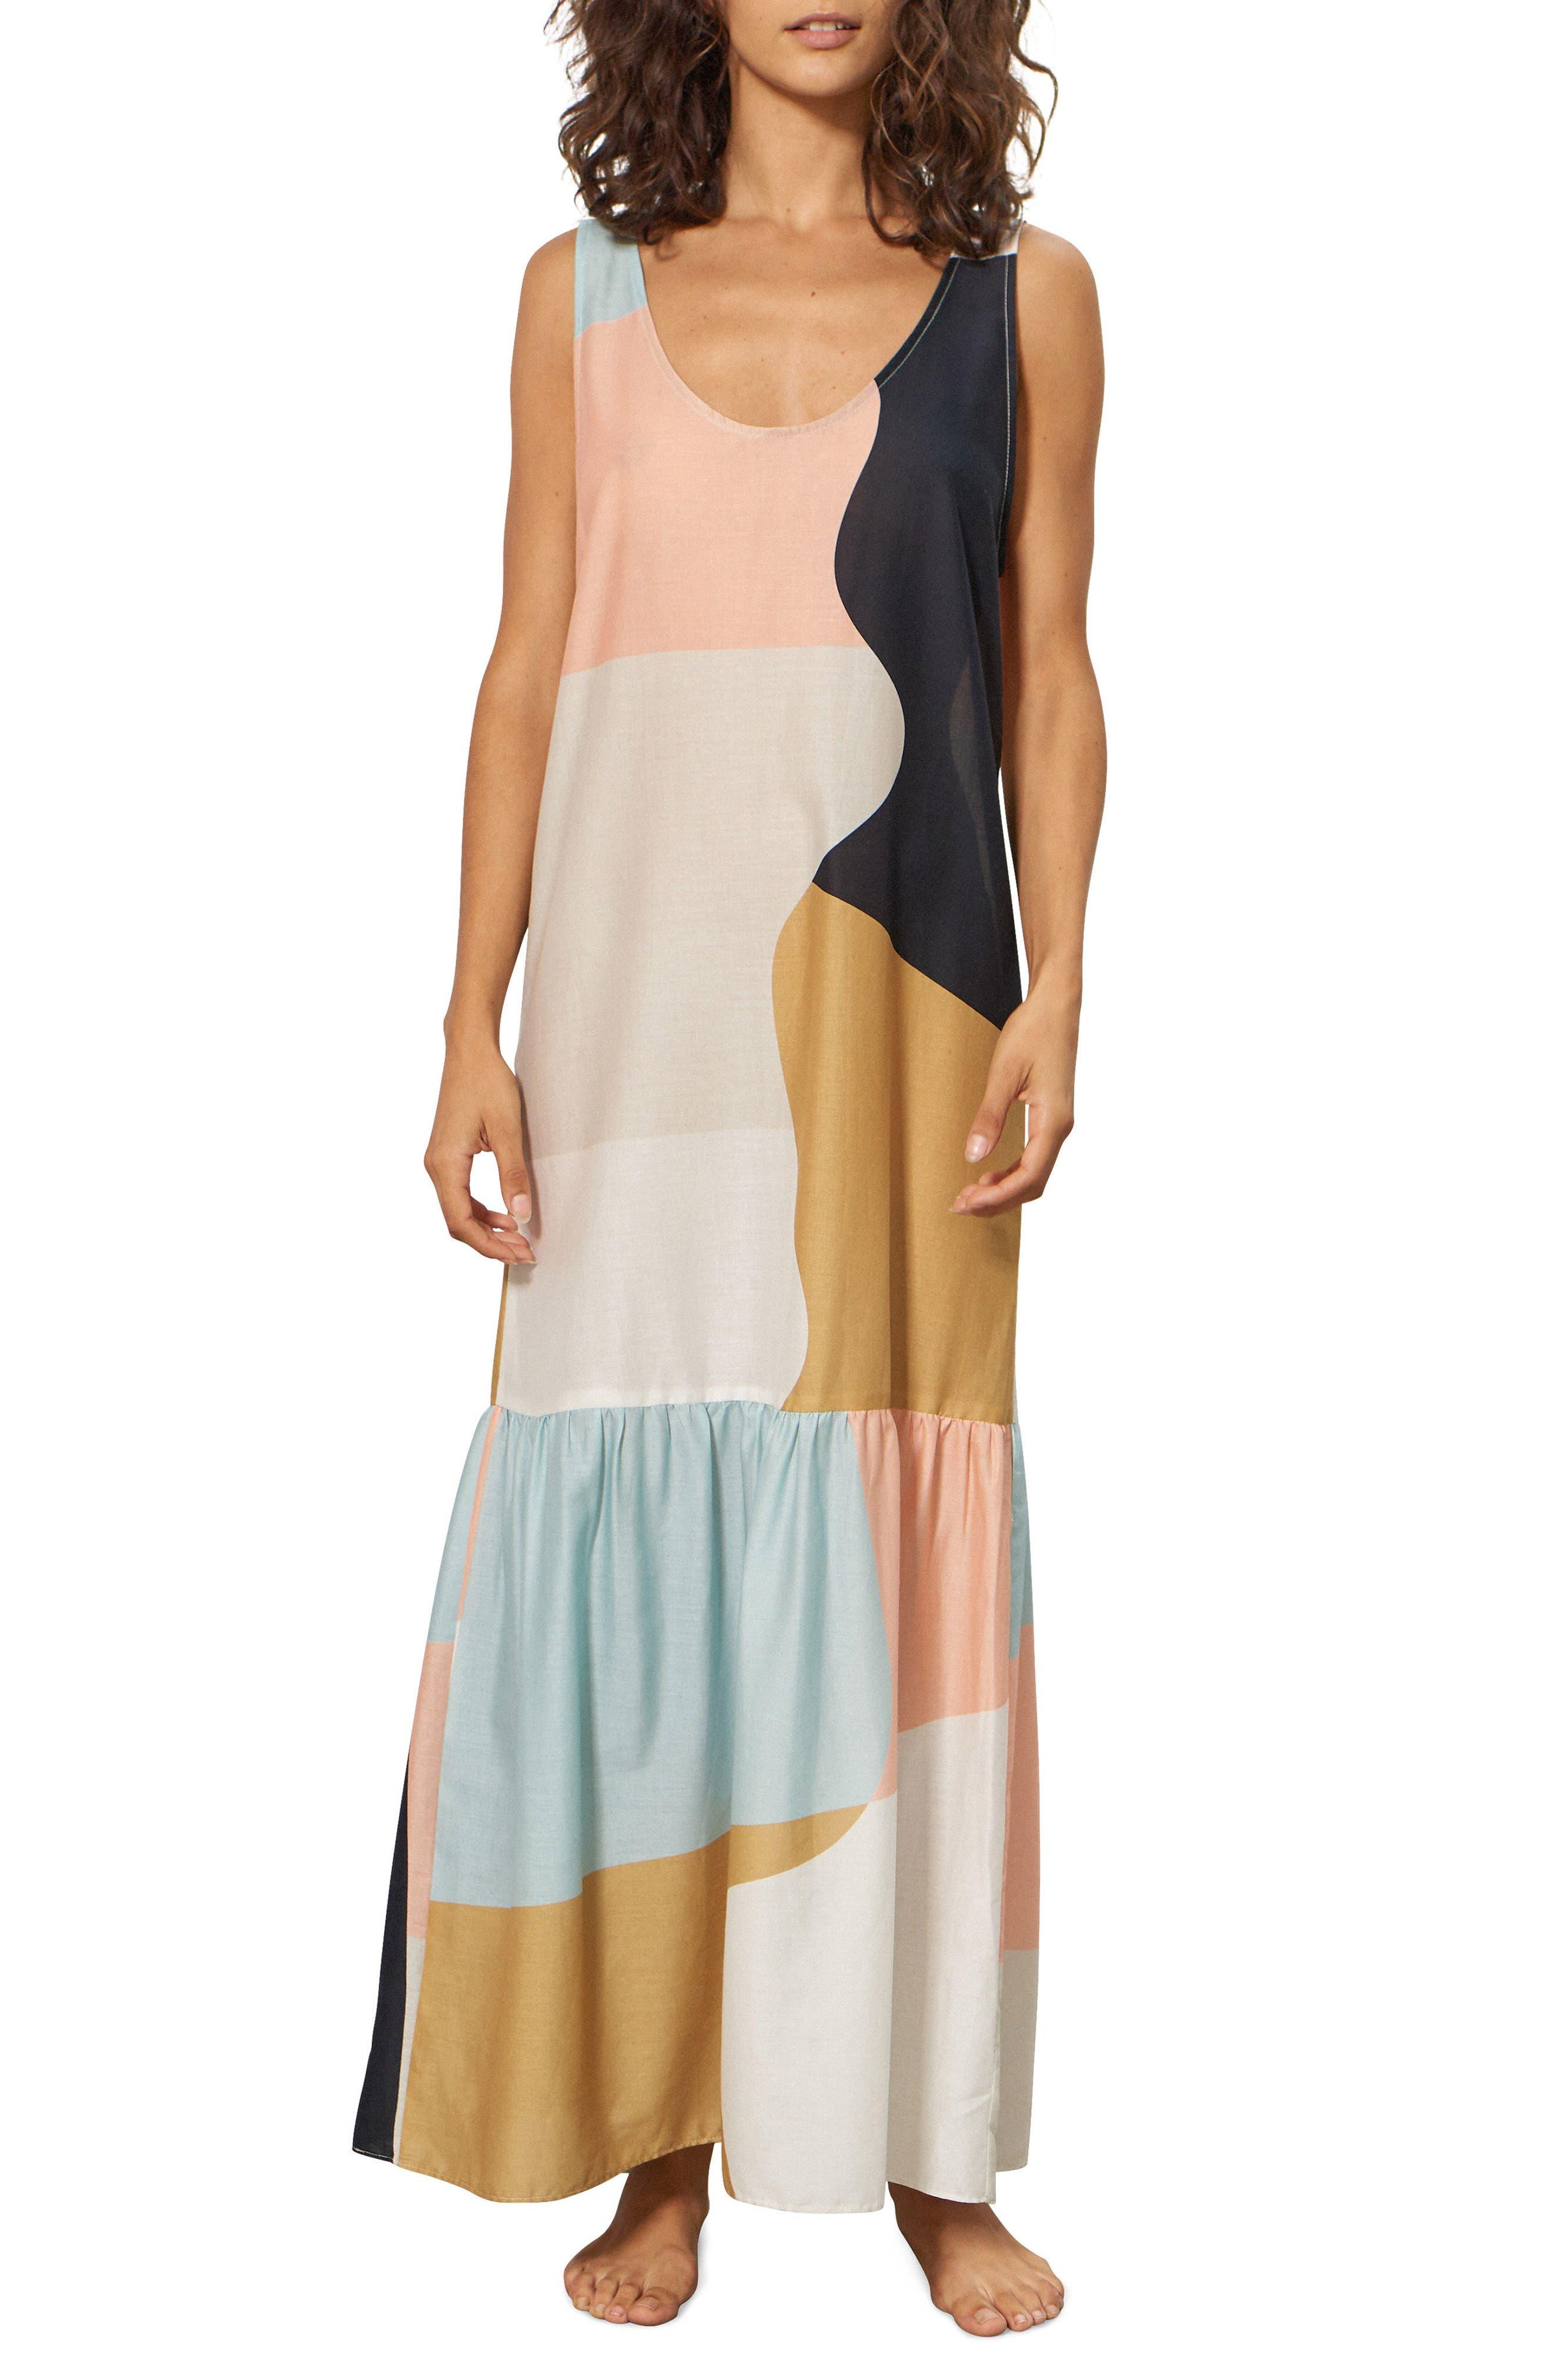 Valentina Cover-Up Dress,                         Main,                         color, Peach Multi